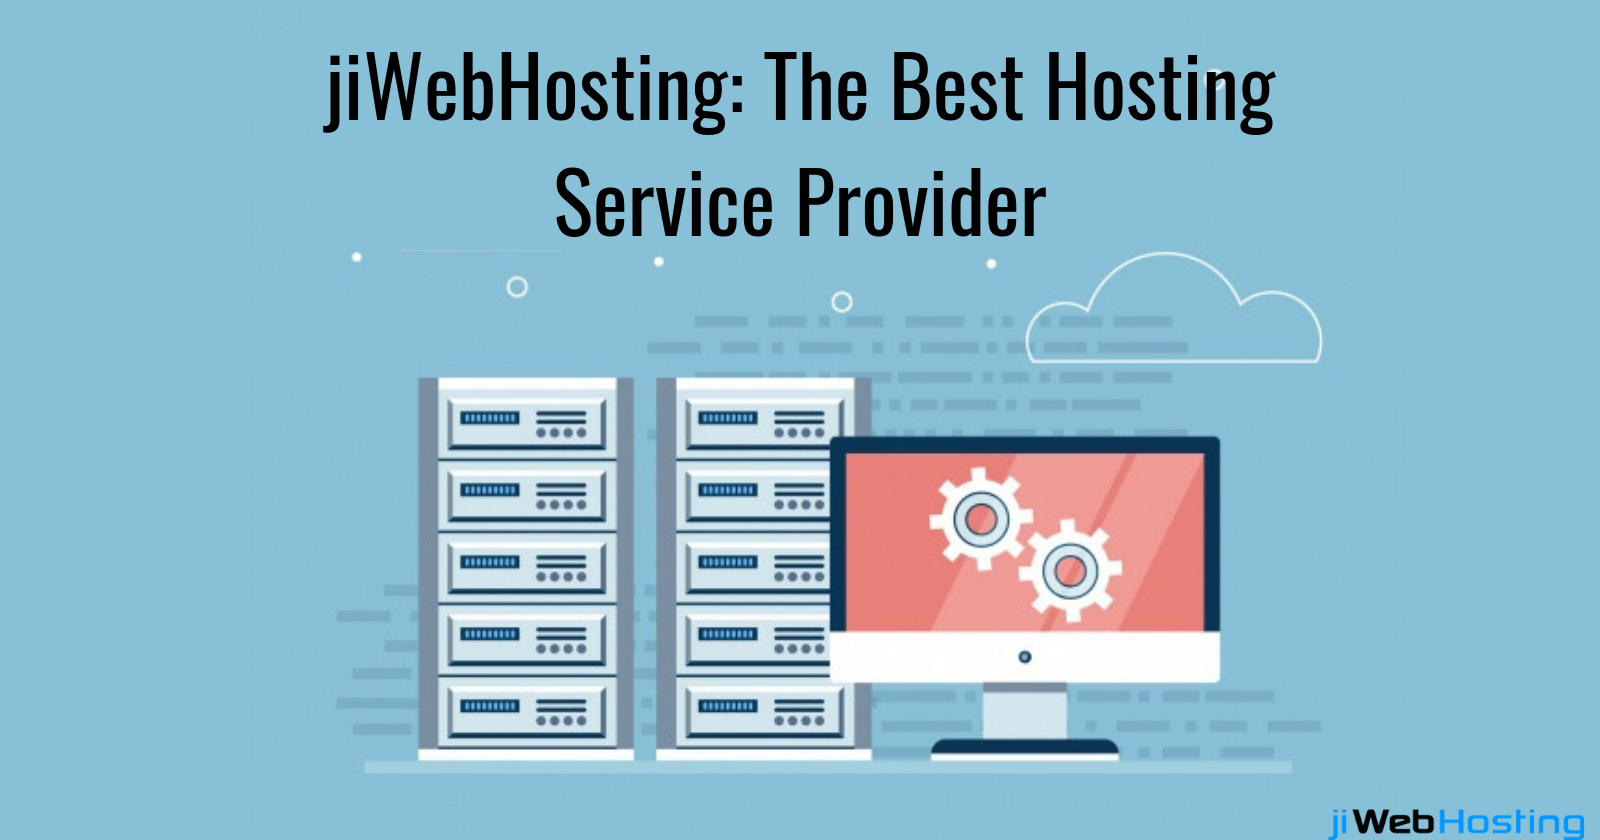 What Makes jiWebHosting The Best Hosting Service Provider?